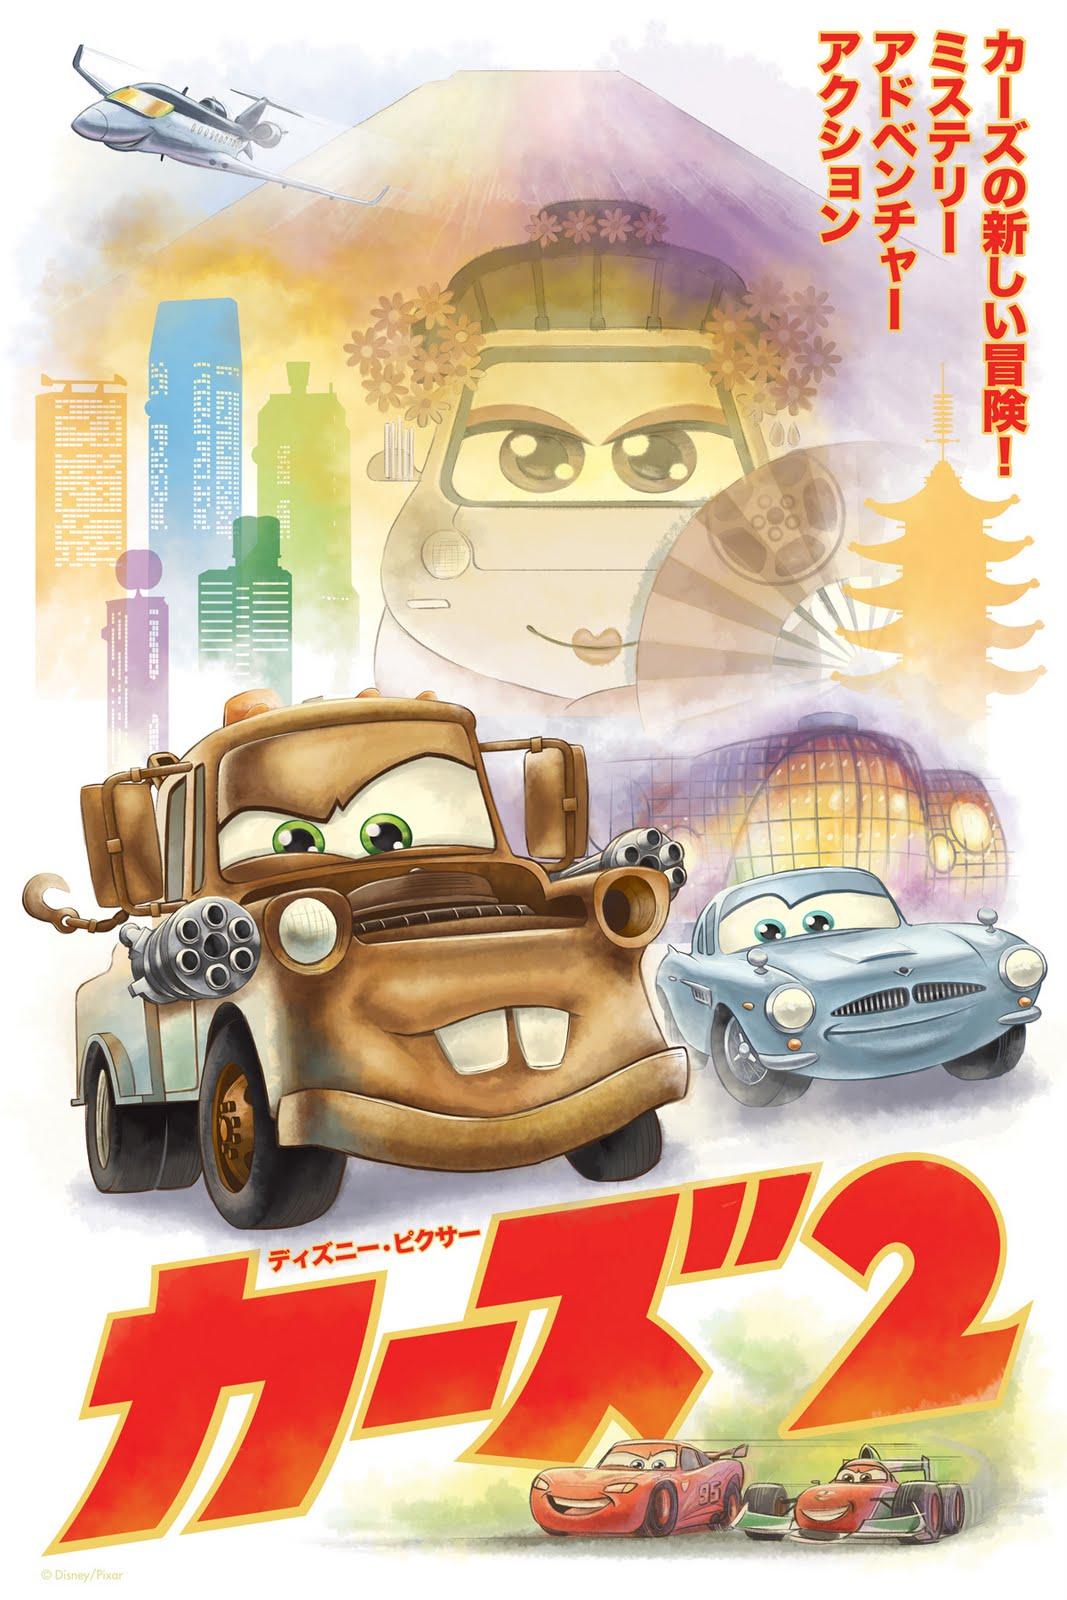 Pixar Corner: Cars 2 Goes to Japan!